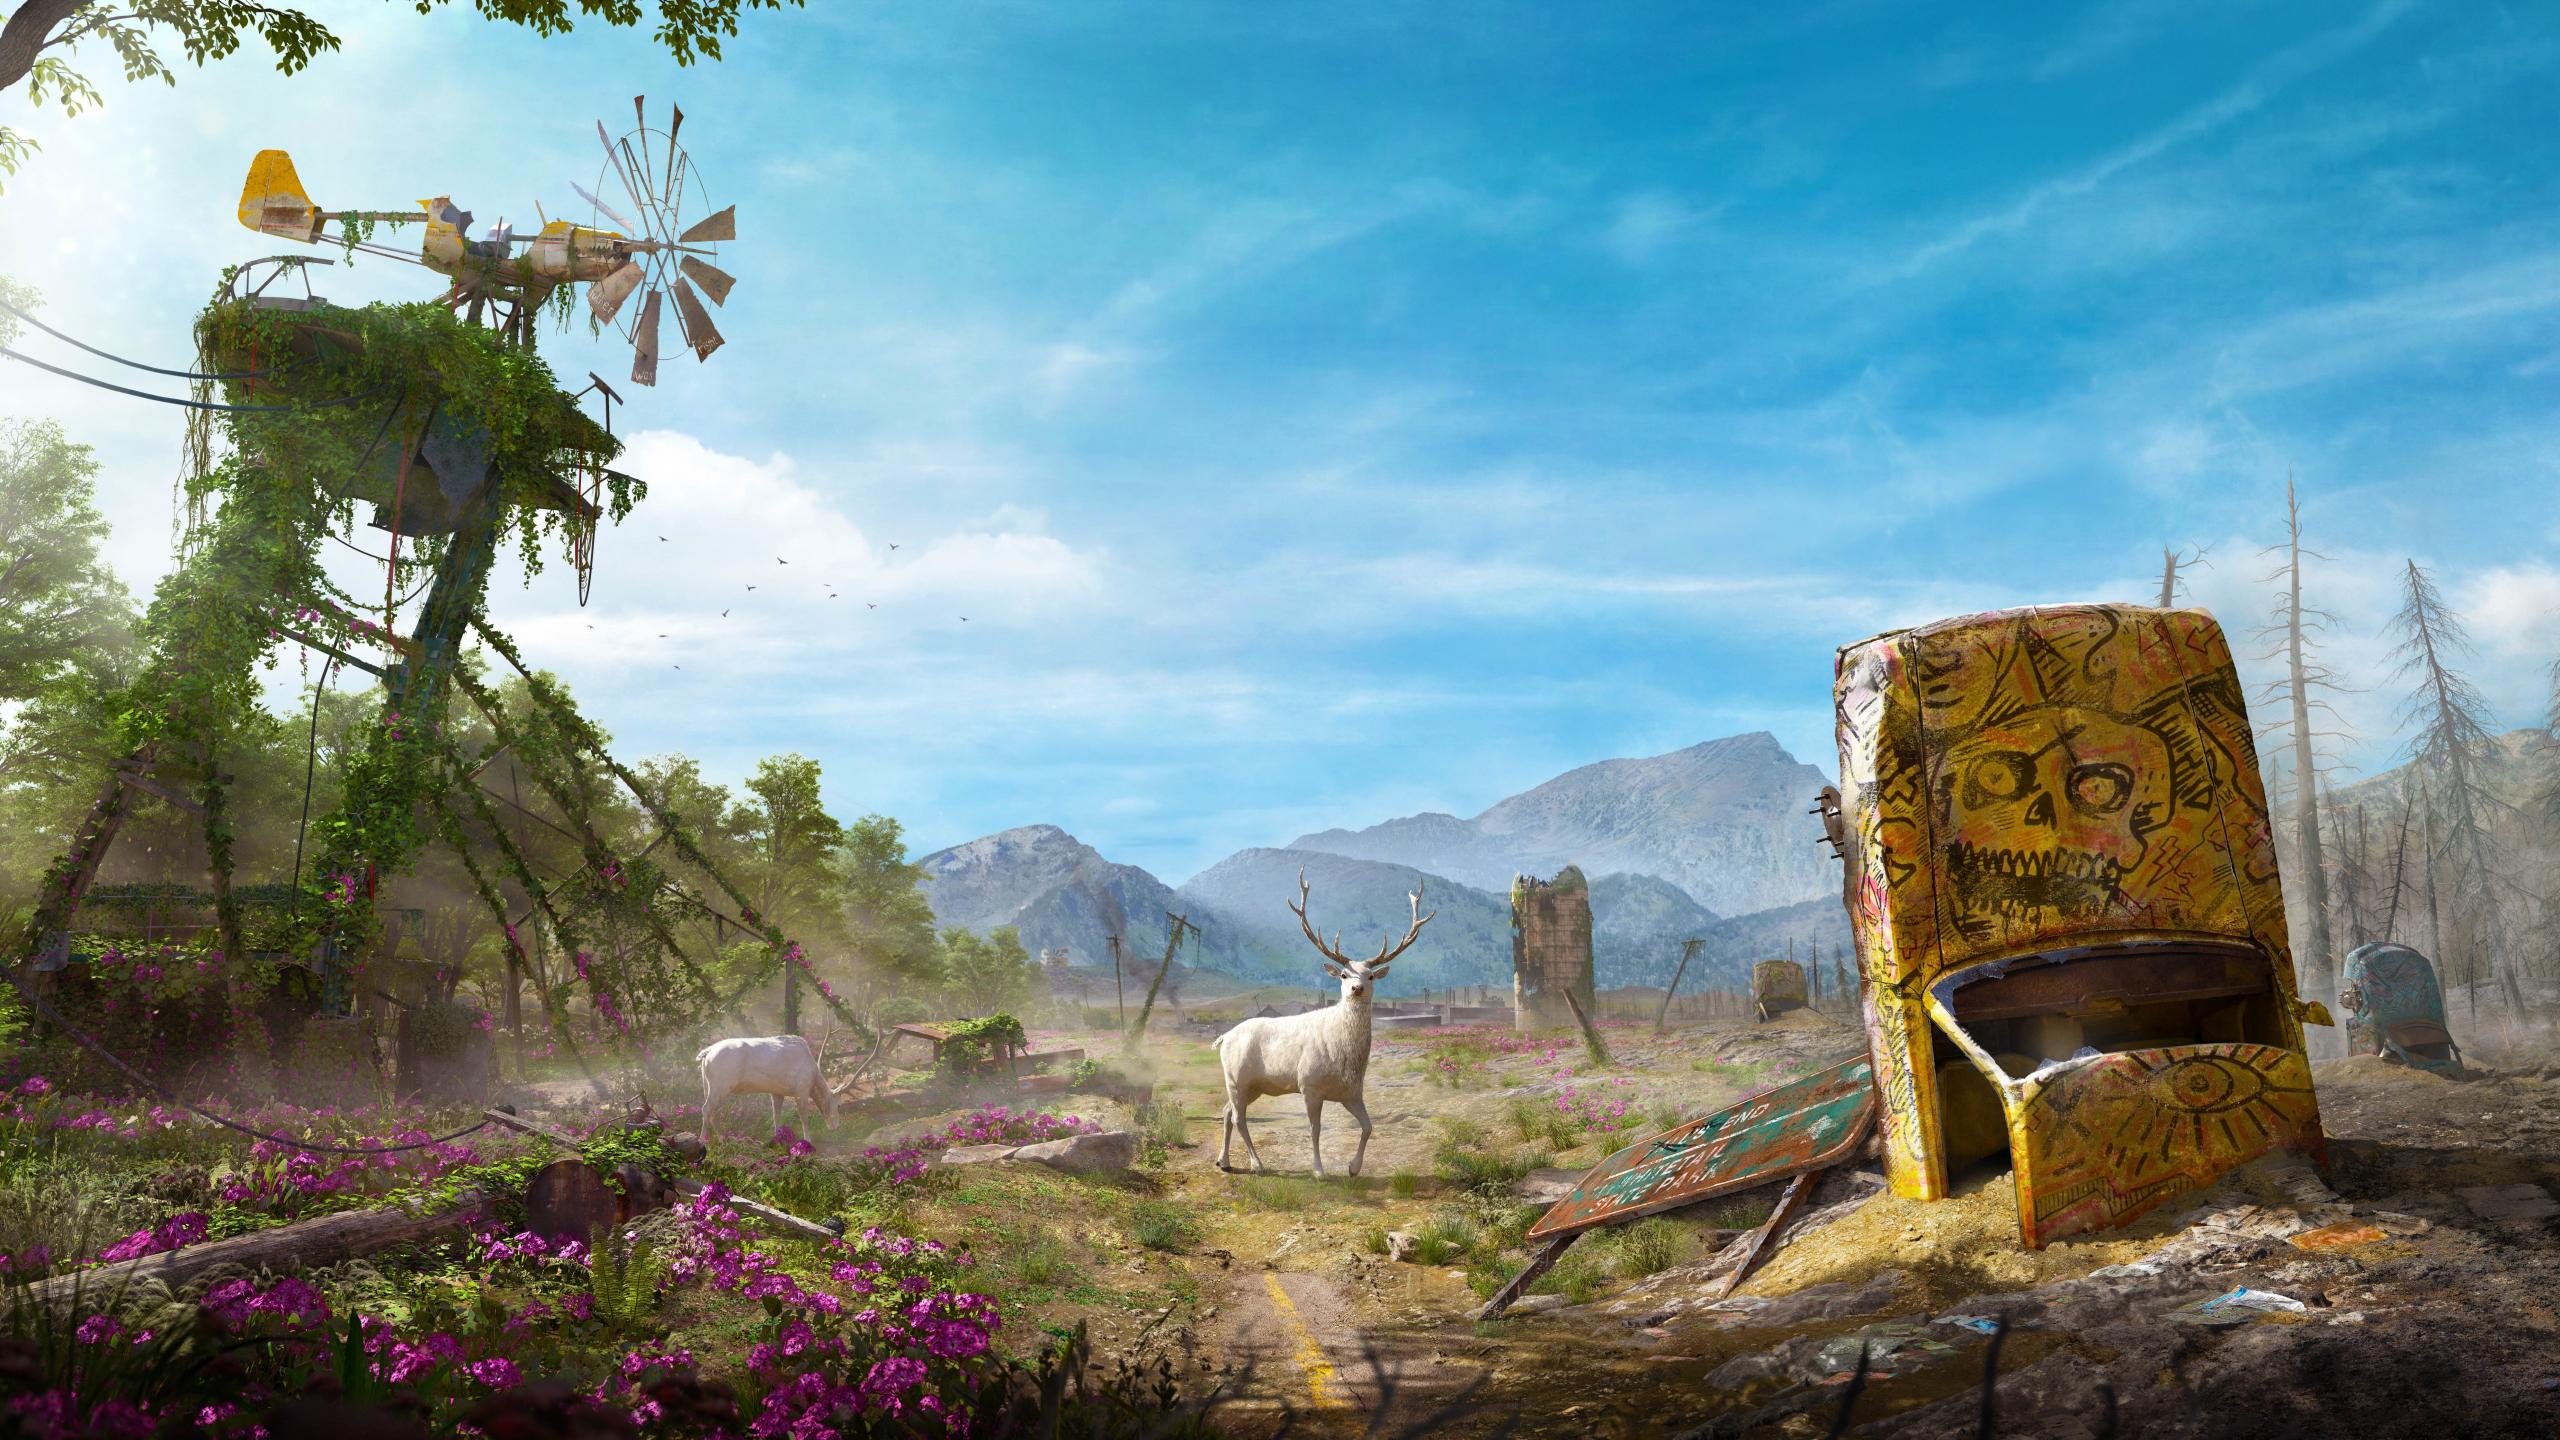 Download 2560x1440 Wallpaper Landscape Deer Video Game Far Cry